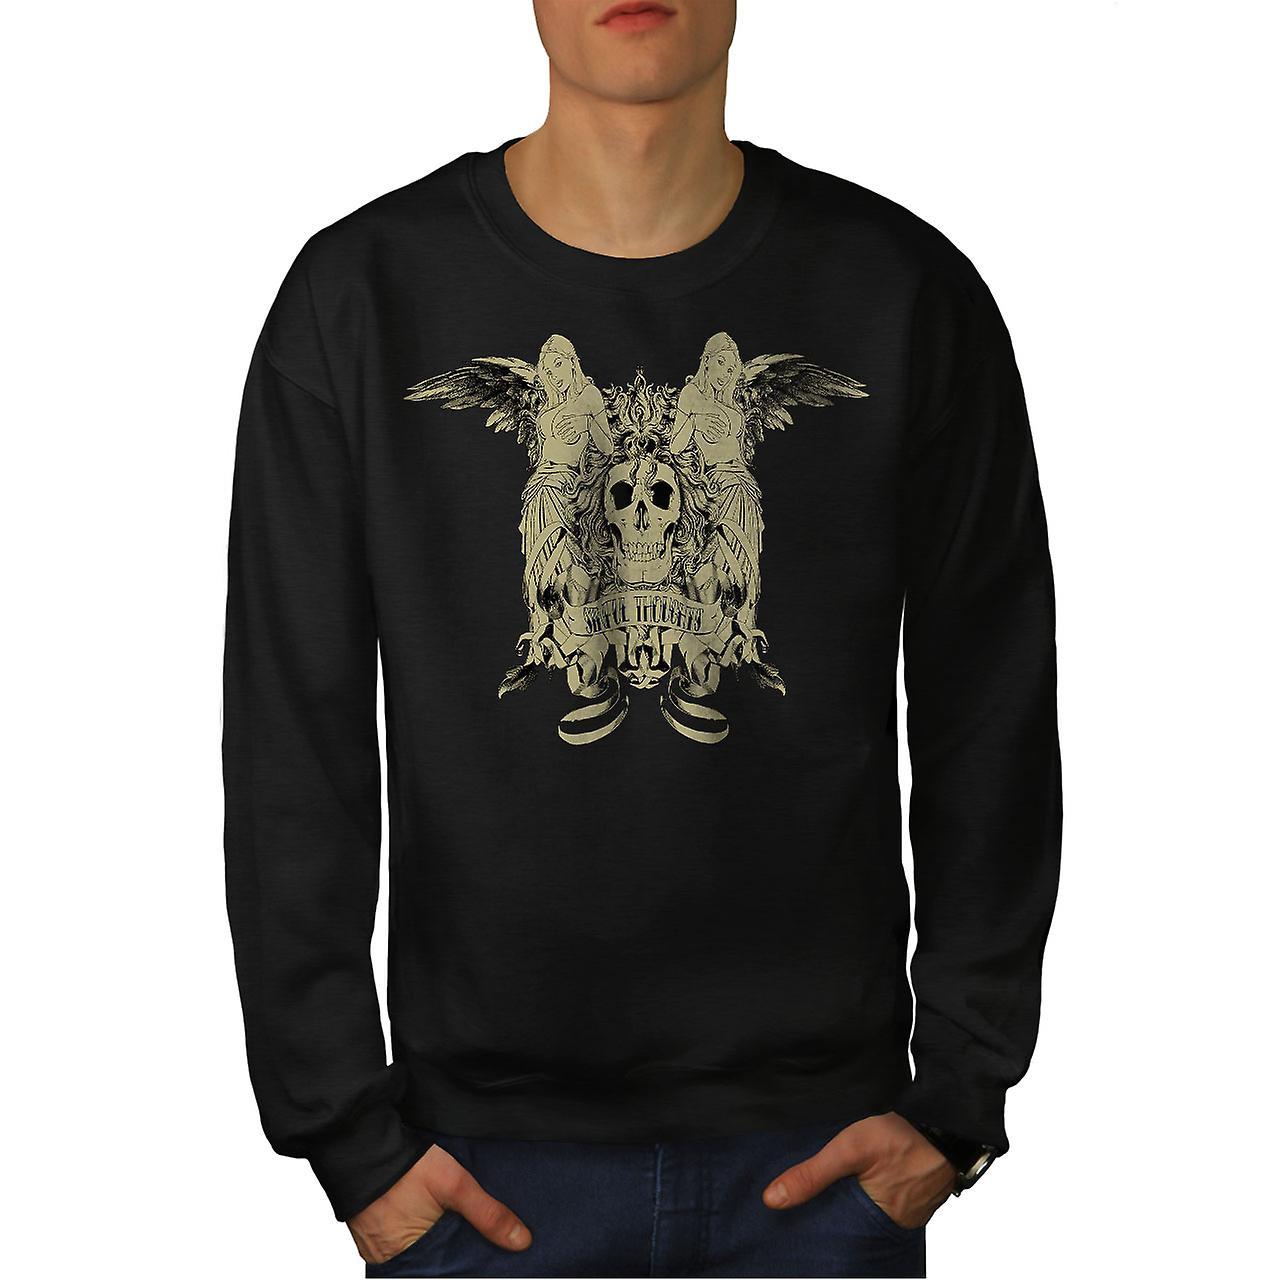 Sündige Gedanken Sexy Skull Männer BlackSweatshirt   Wellcoda